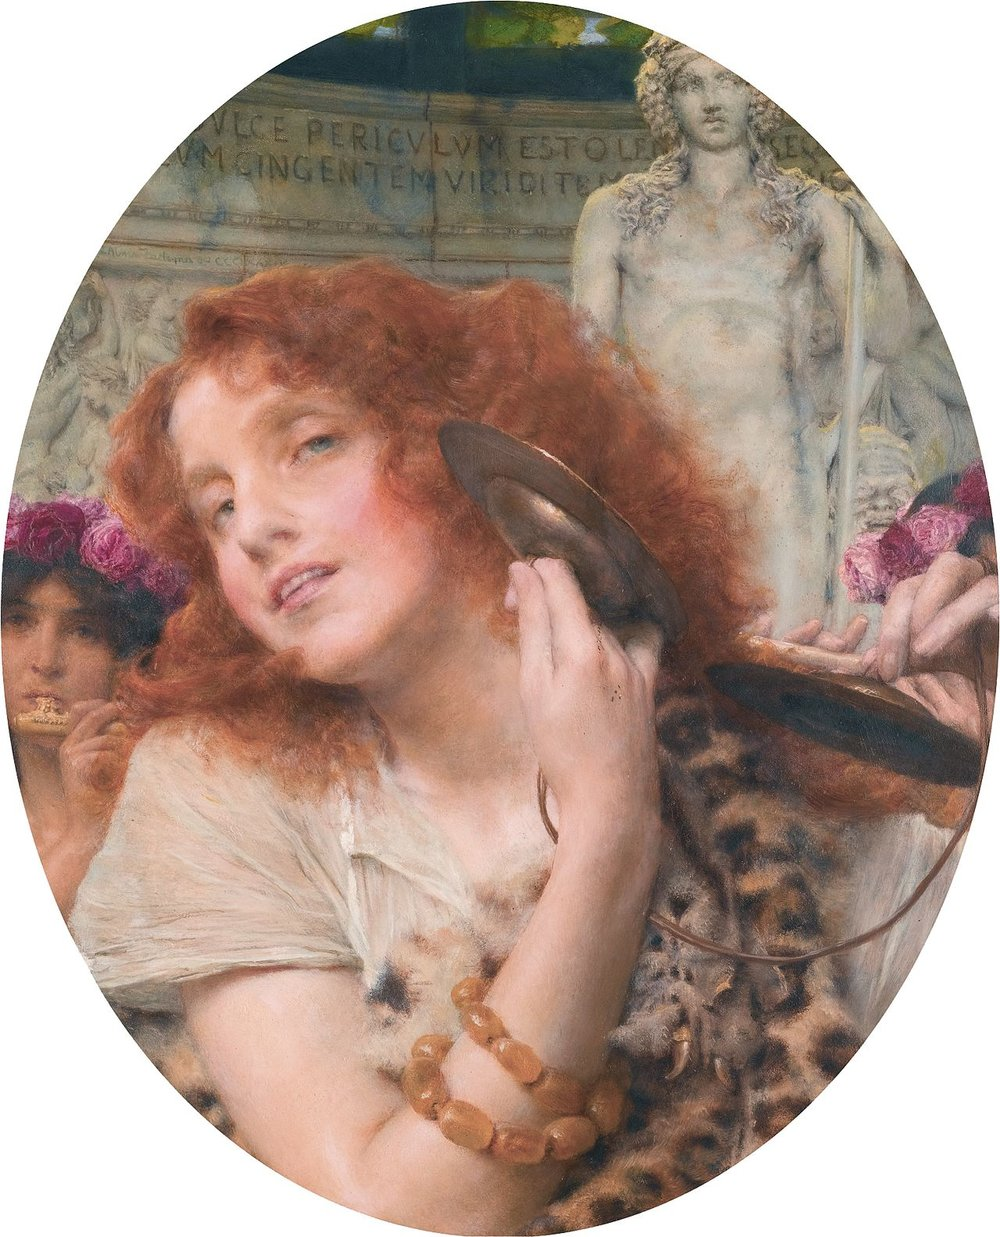 Bacchante by Lawrence Alma-Tadema